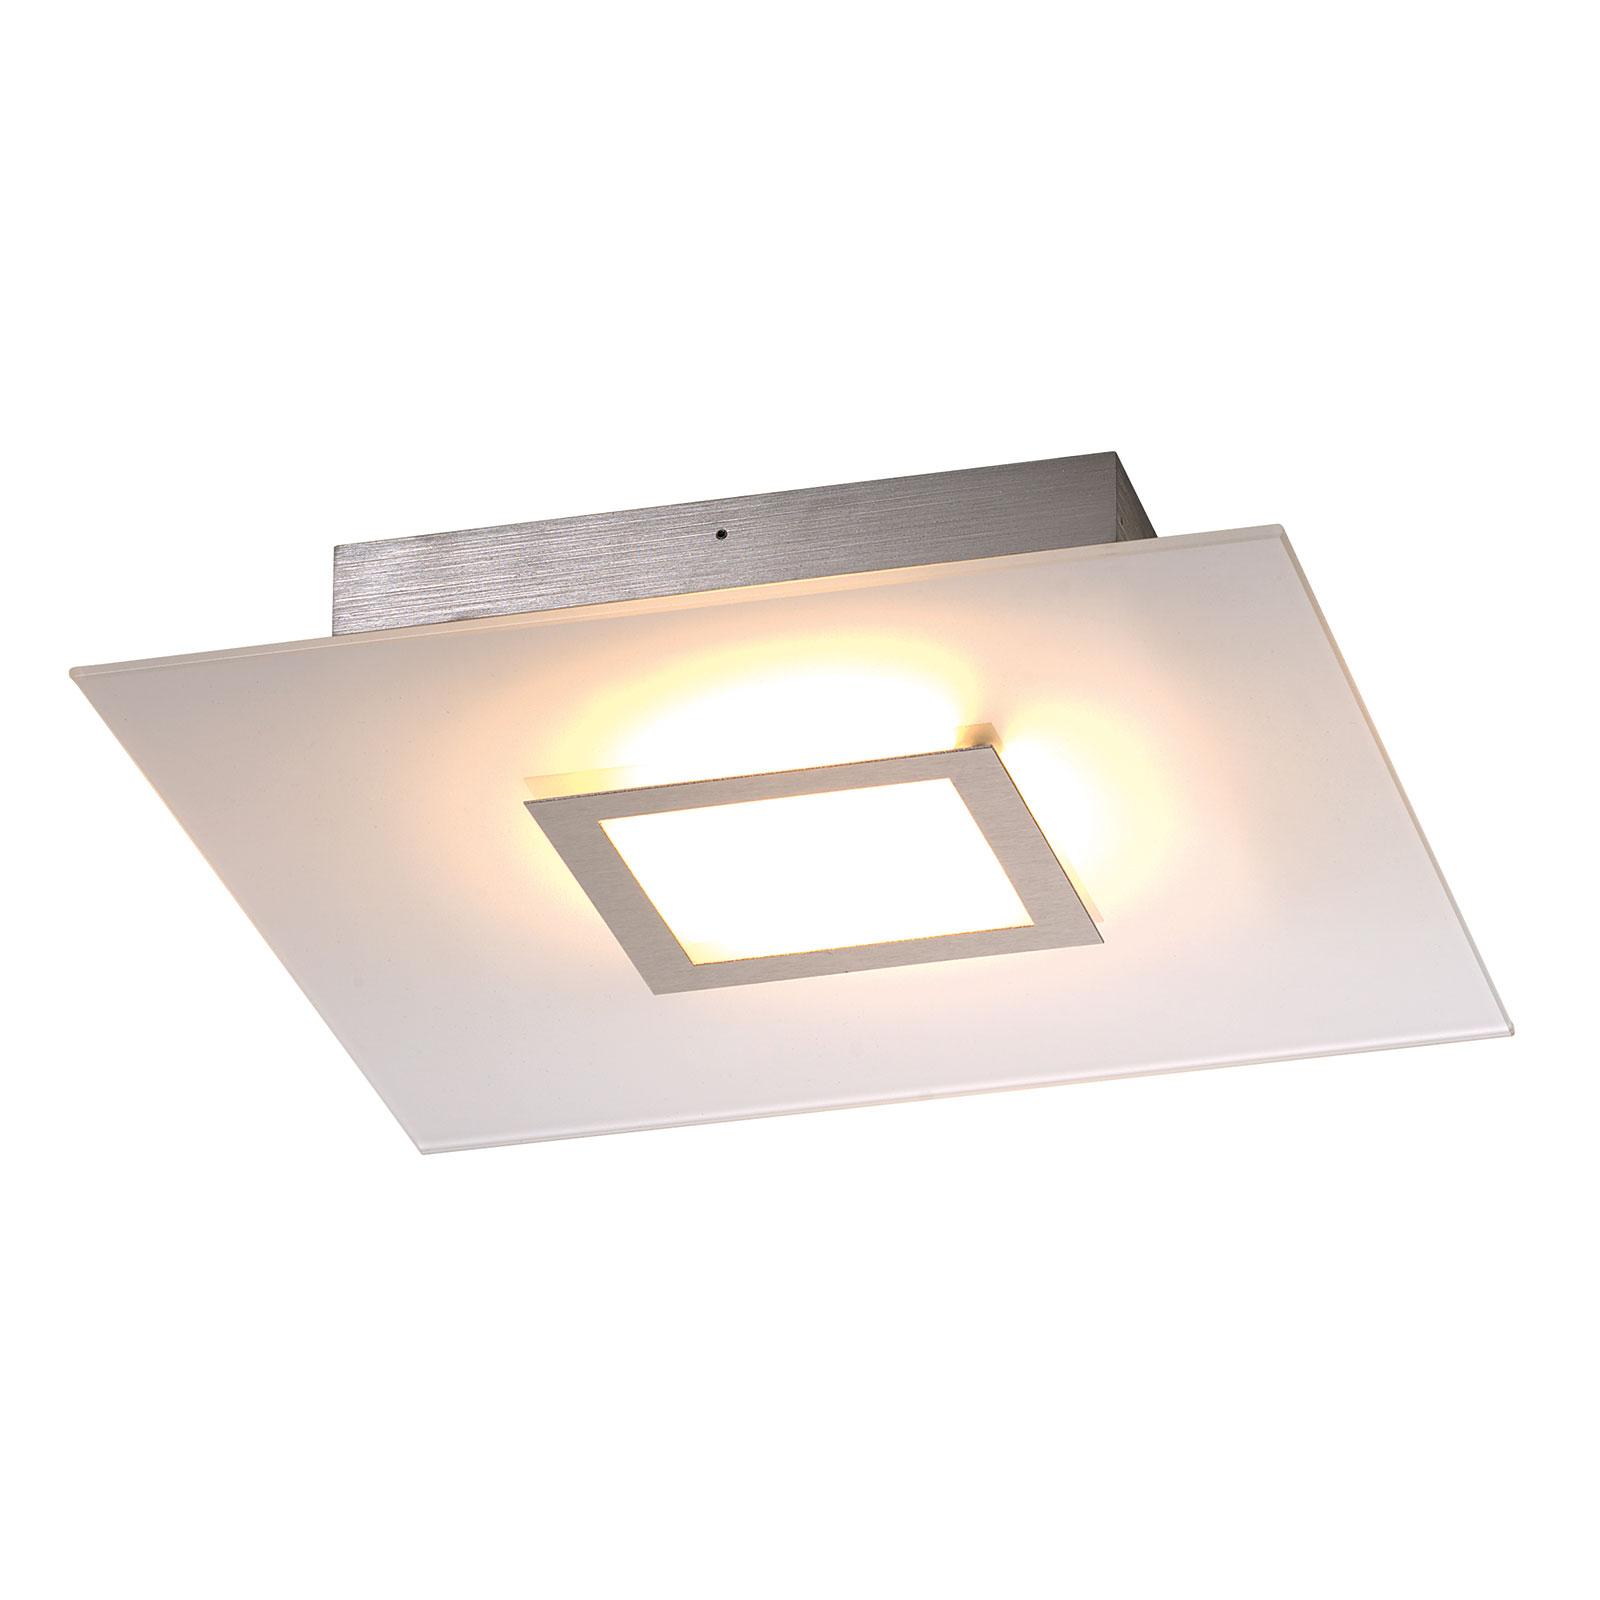 Flat kvadratisk LED-taklampe, dimbar